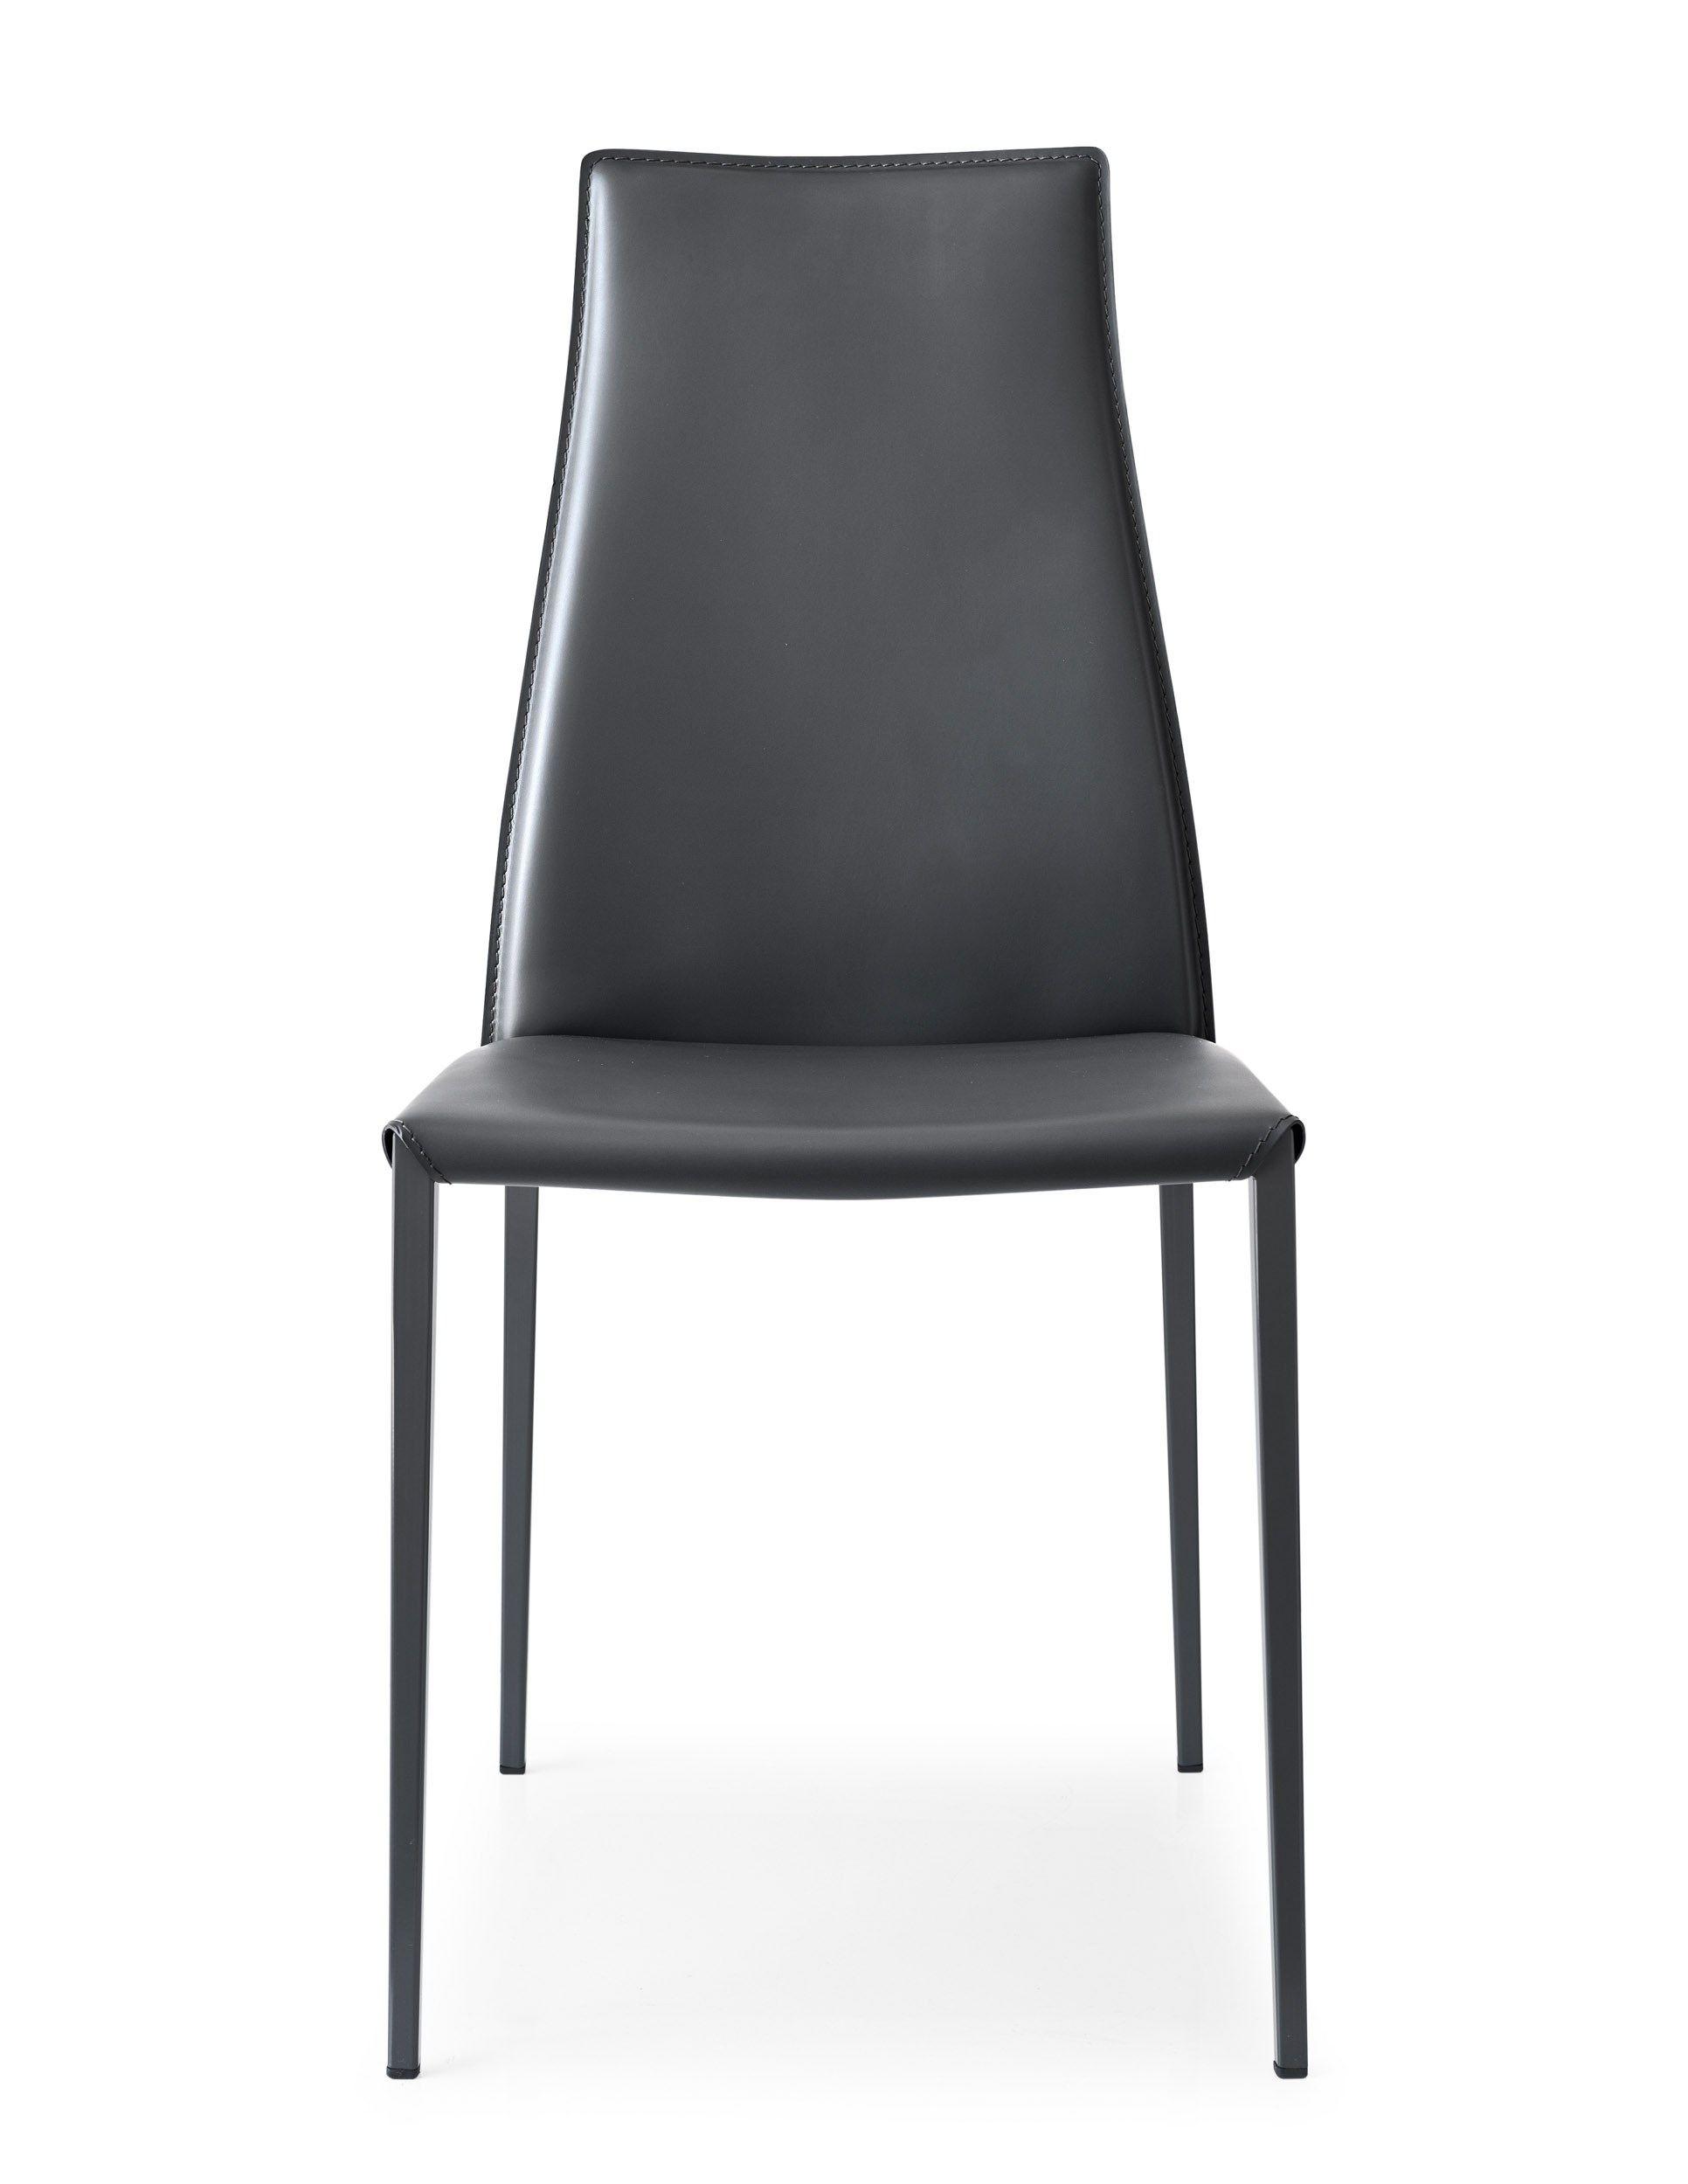 Aida sedia in cuoio rigenerato by calligaris design studio 28 for Calligaris sedie prezzi